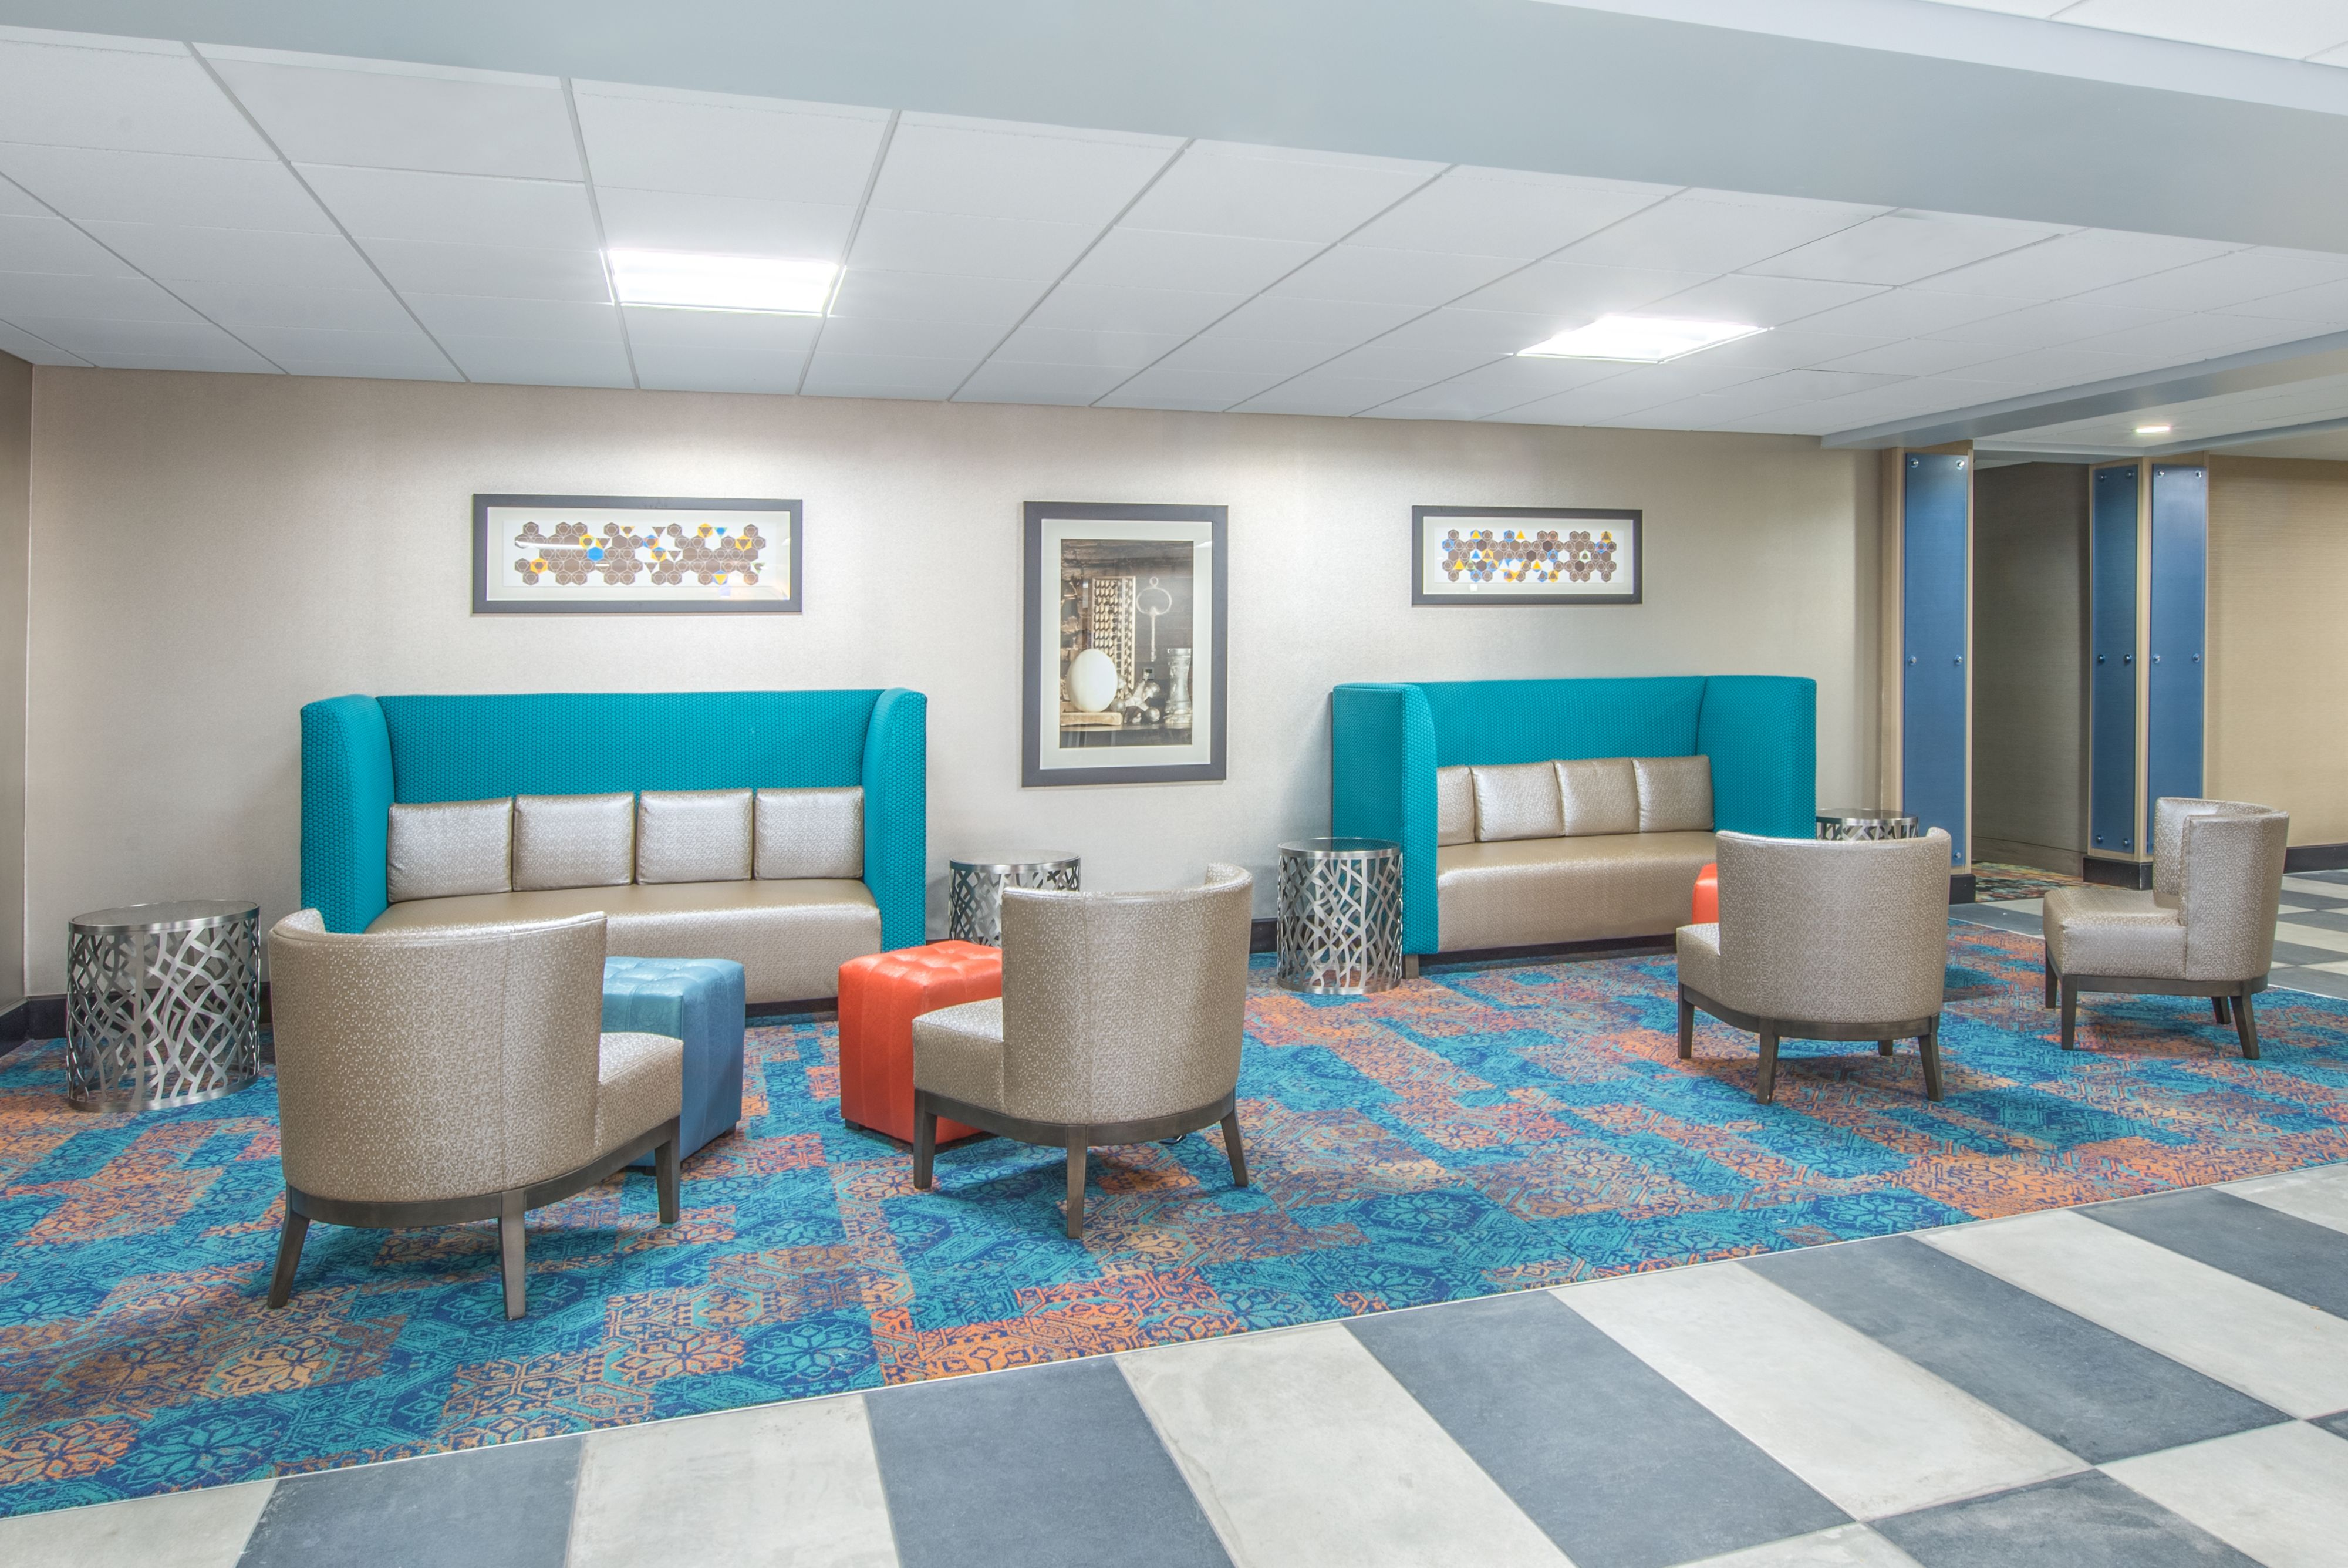 Holiday Inn Express & Suites Shawnee-Kansas City West image 4